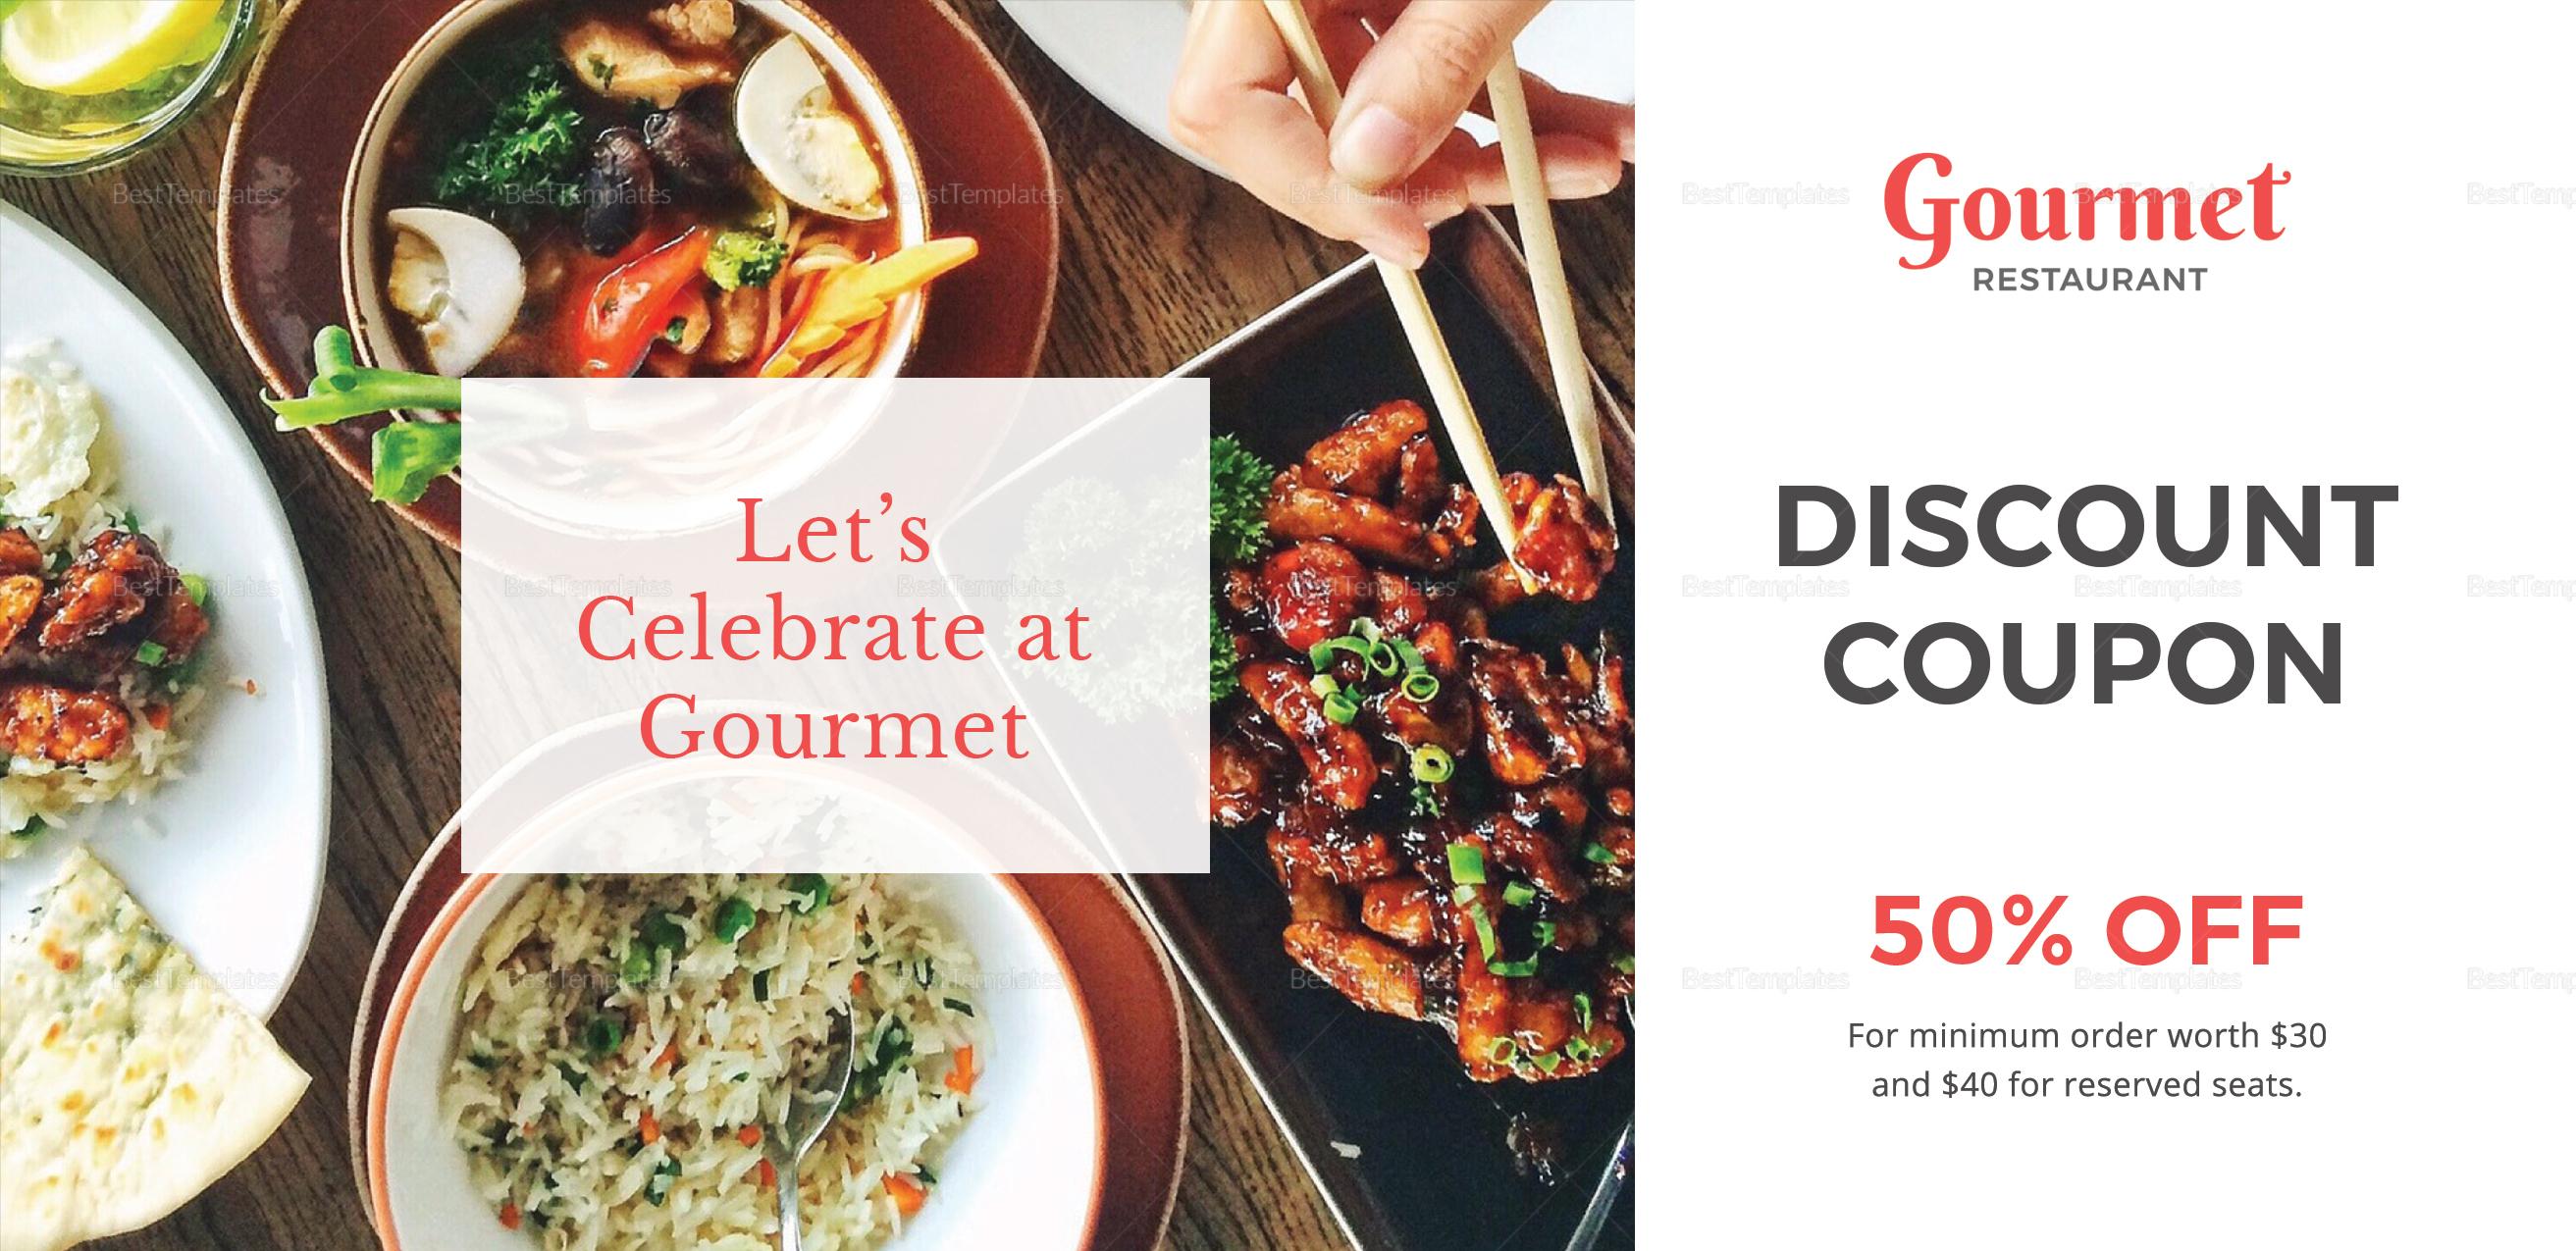 Restaurant Discount Coupon Template